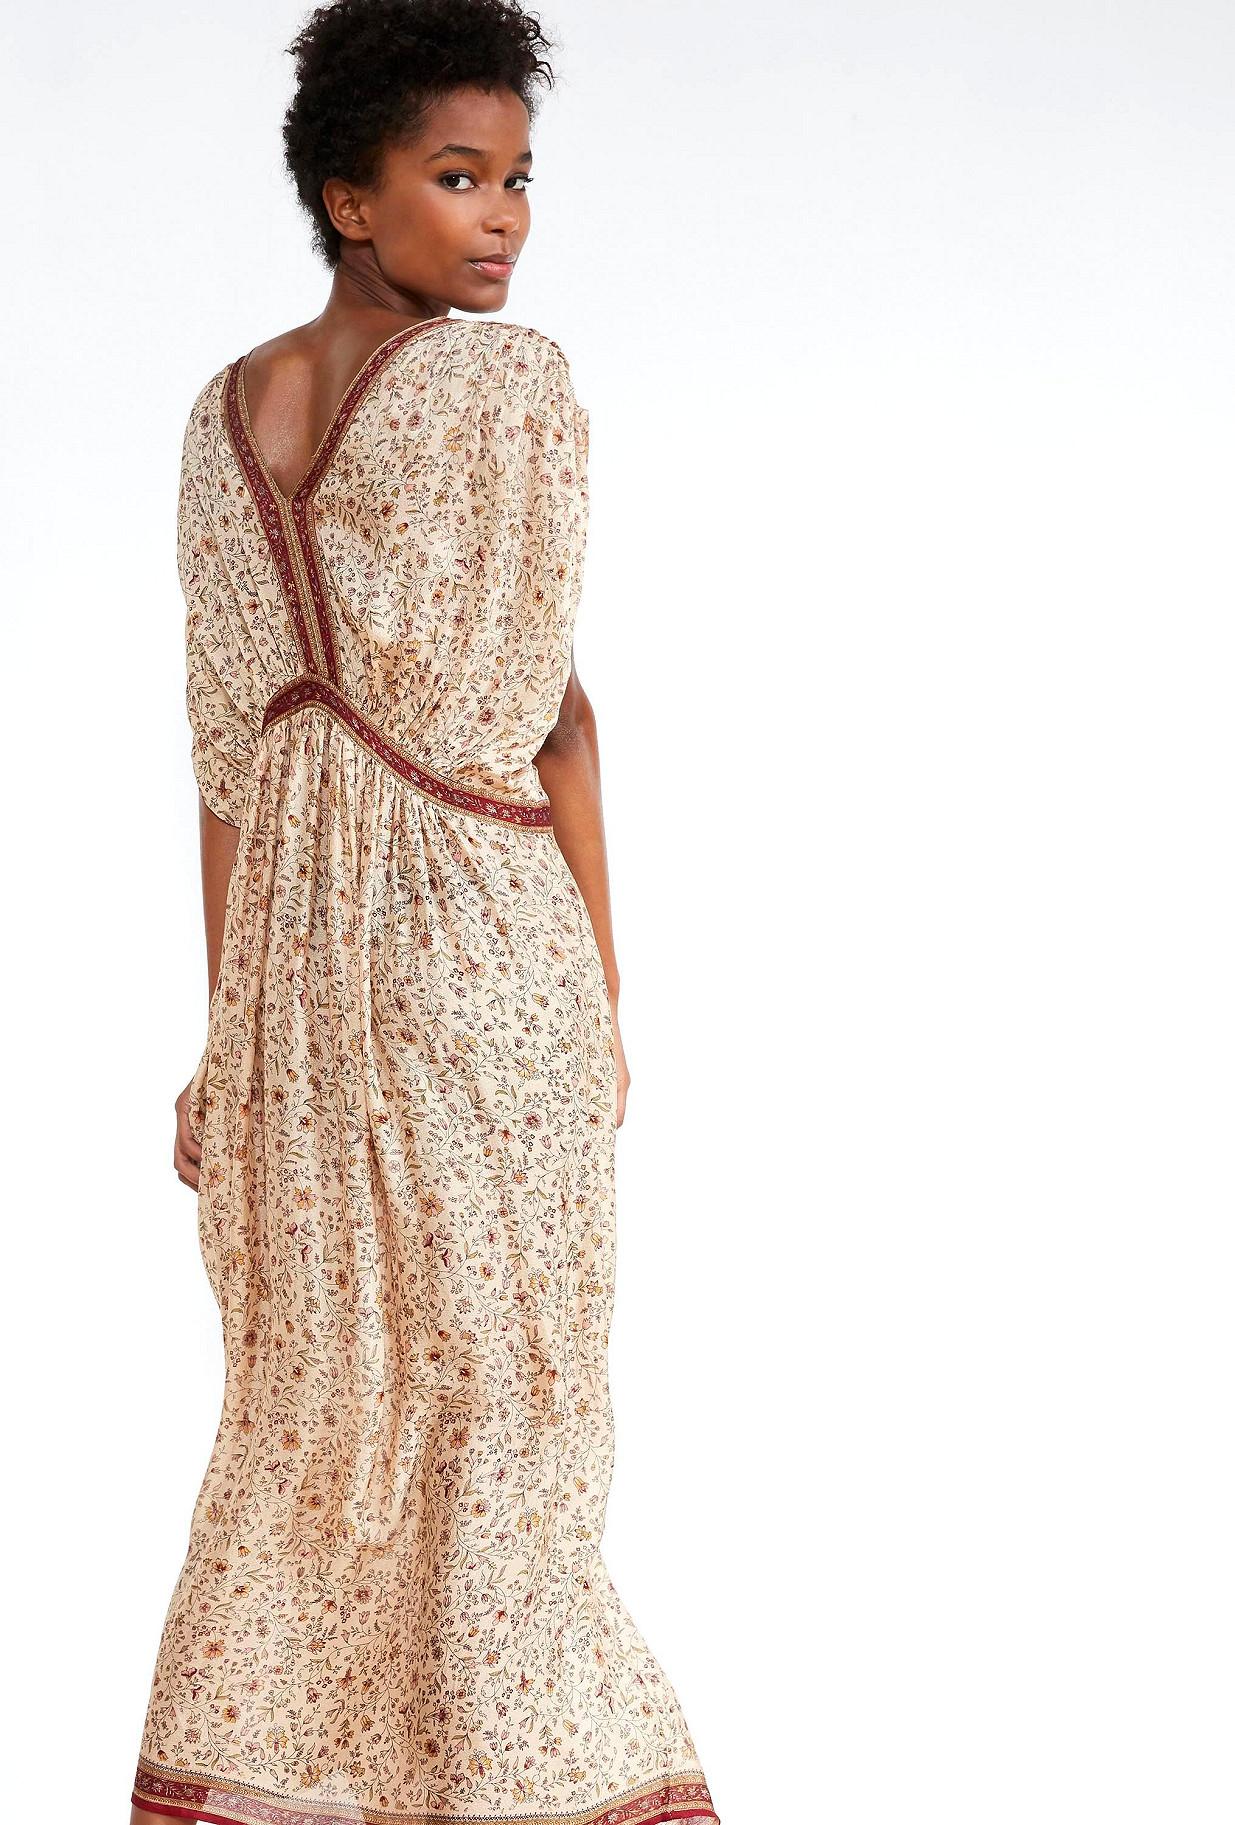 clothes store DRESS  Carthage french designer fashion Paris